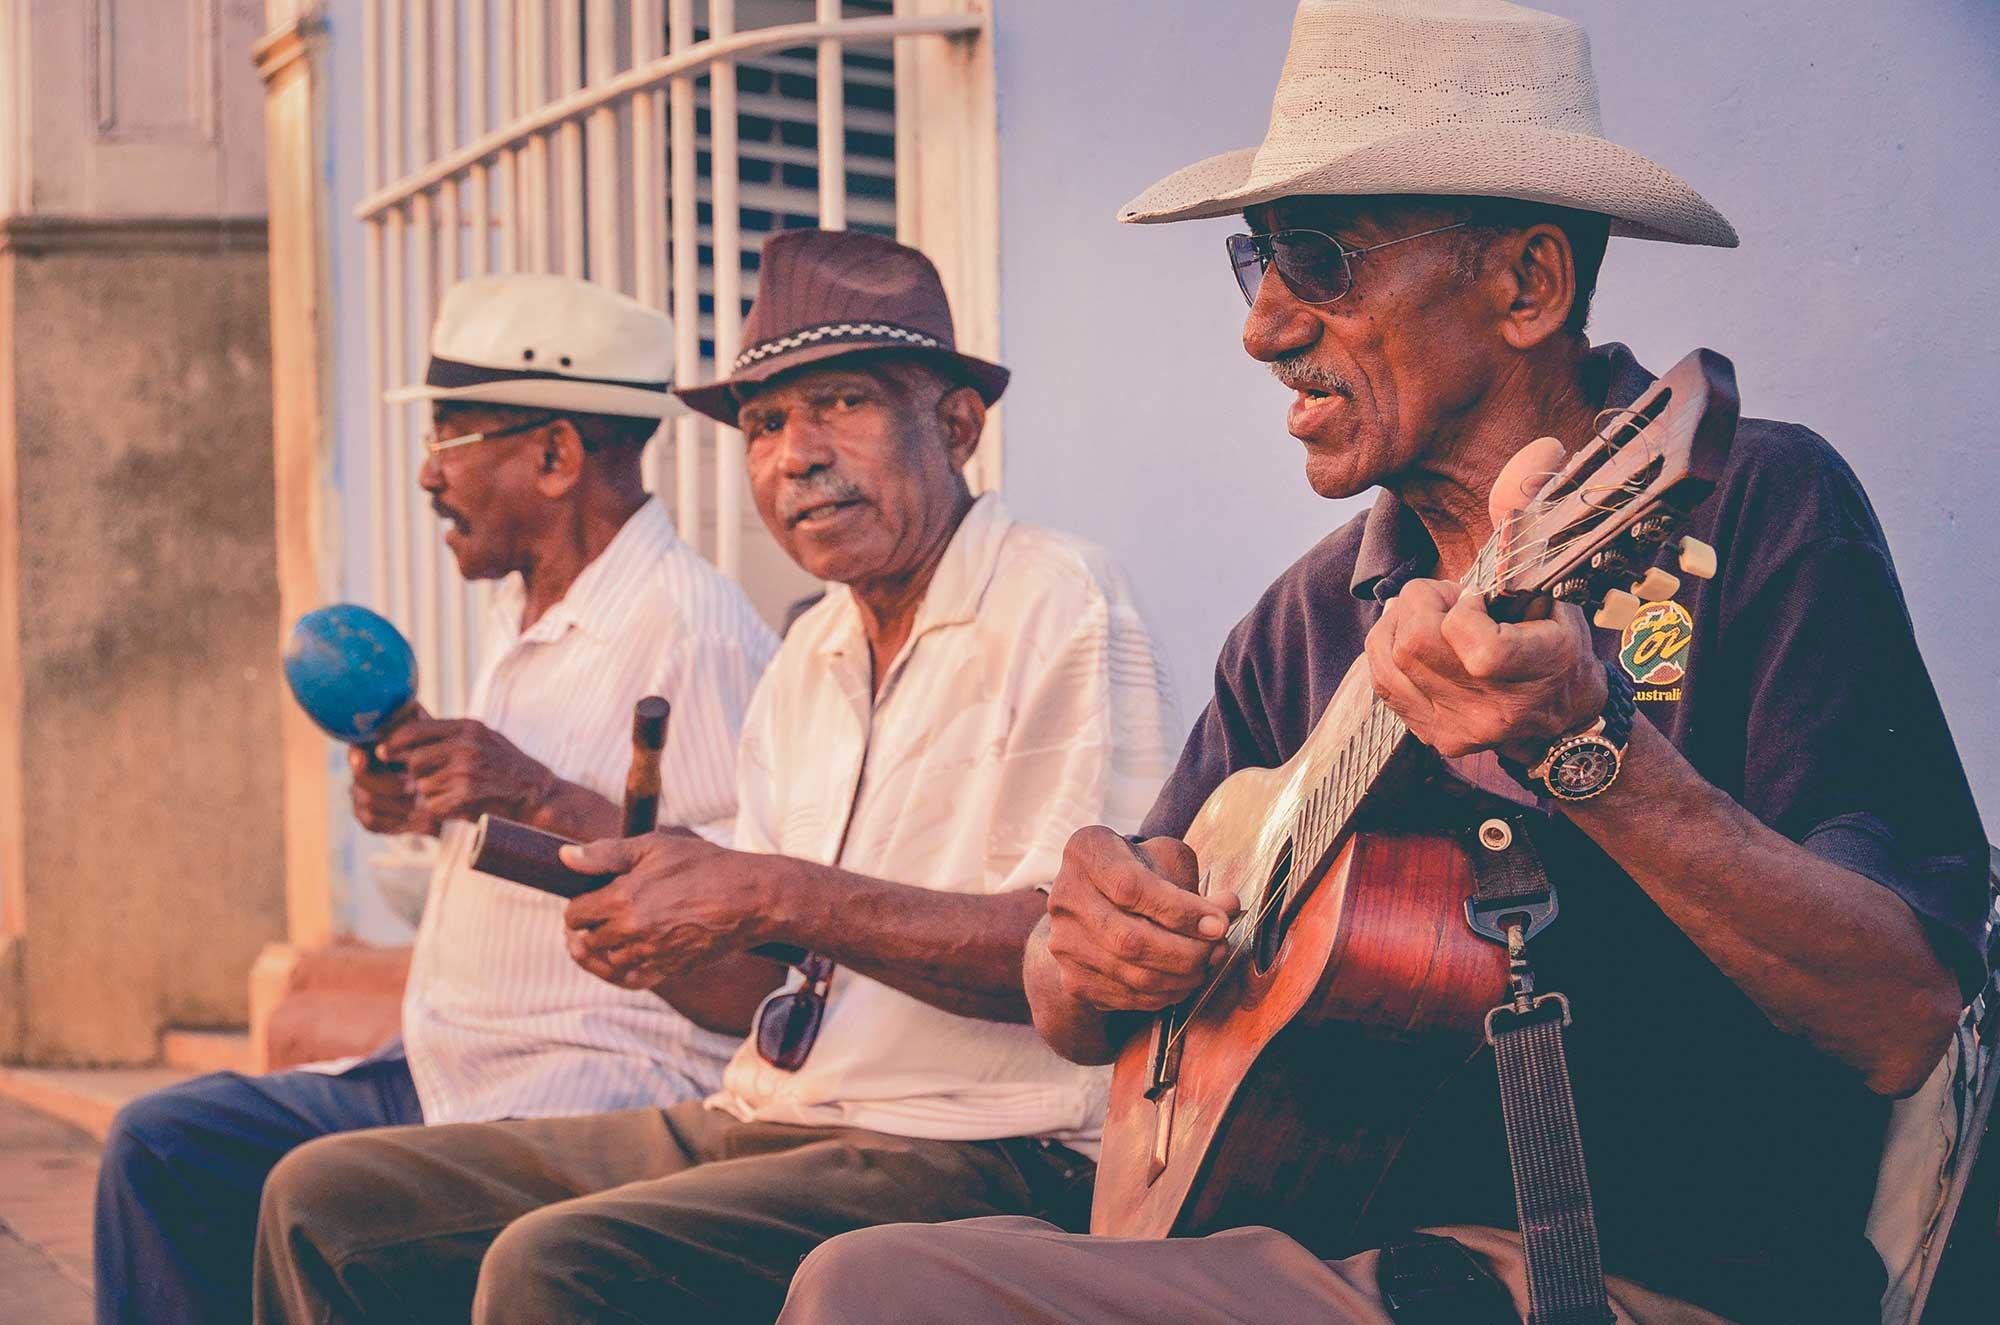 Jose Mier and street band Havana